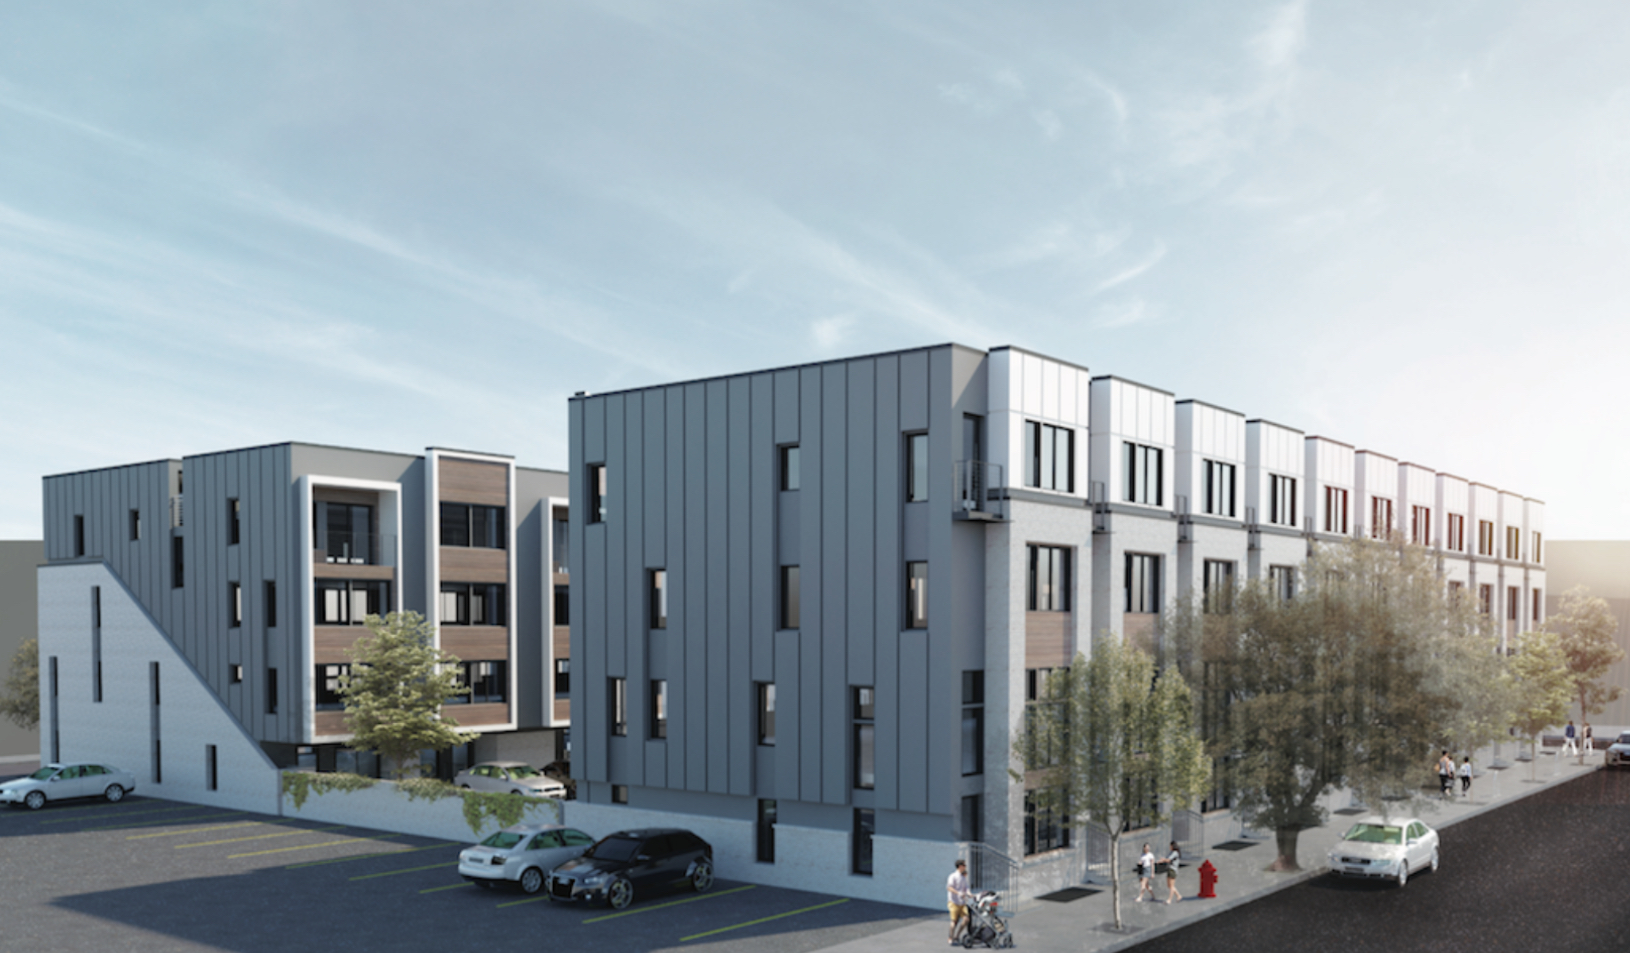 Rendering of 2600-40 East Hagert Street. Credit: HDO Architecture.